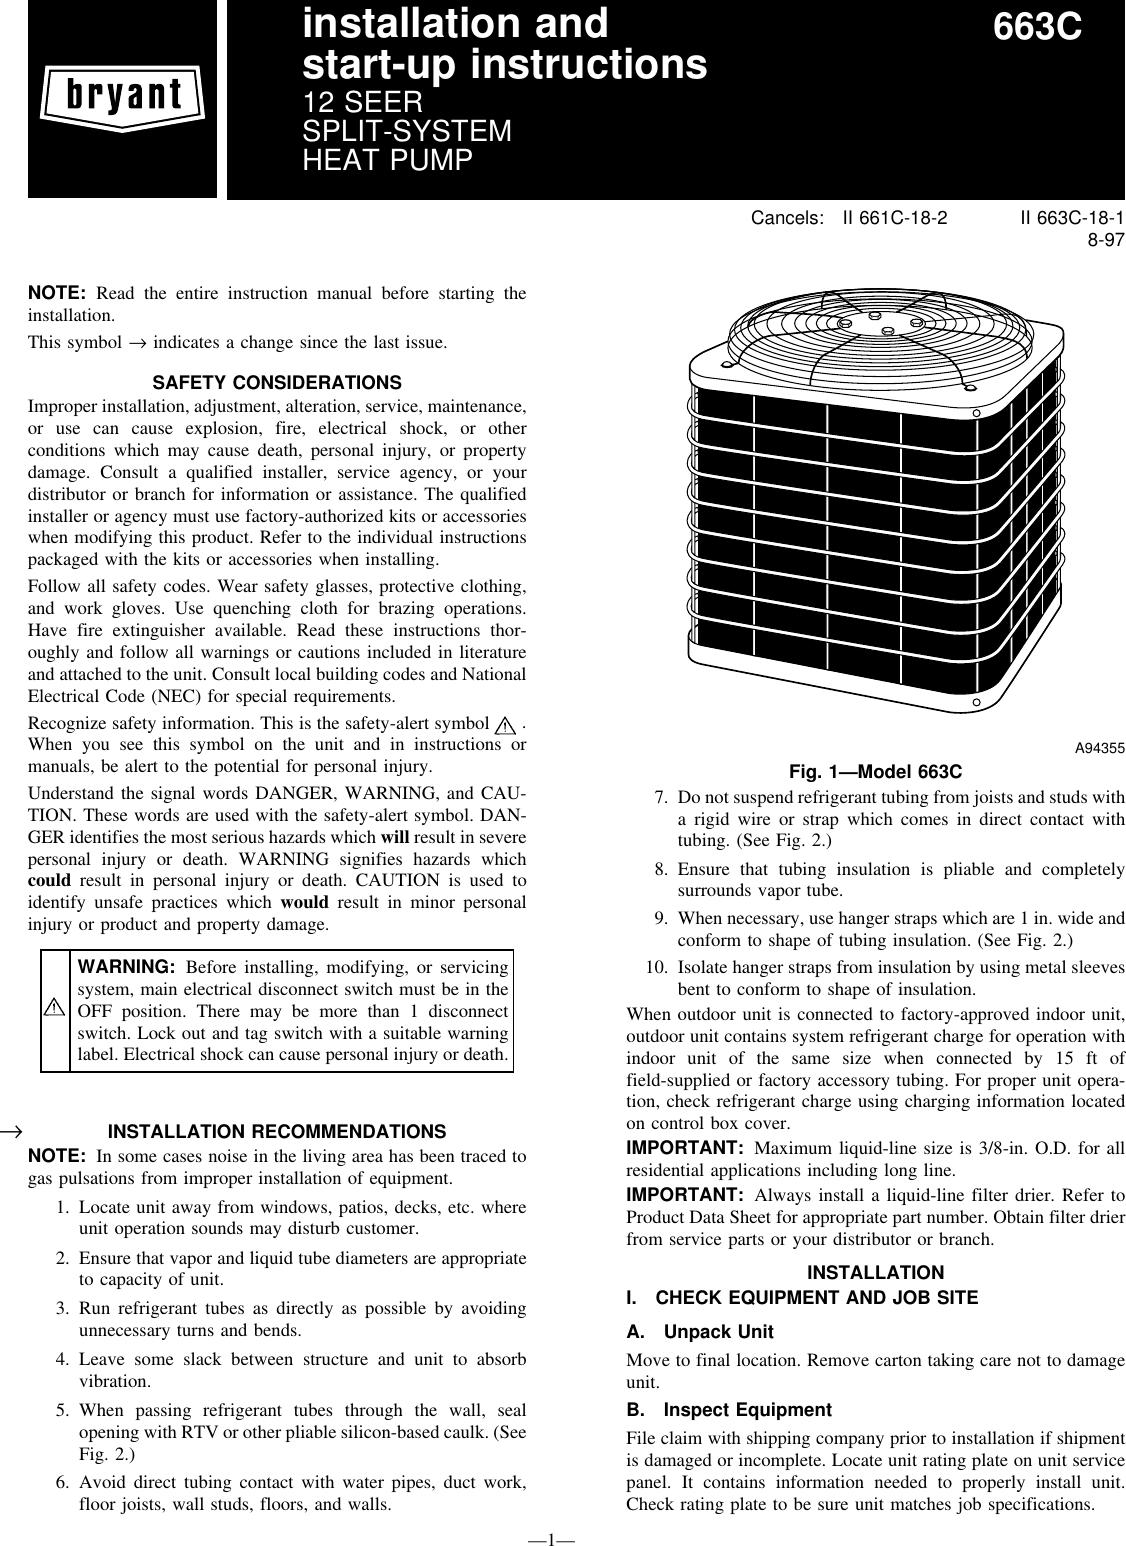 bryant 663c users manual rh usermanual wiki Bryant Heat Pump Wiring Diagram 265 Bryant Heat Pump Models